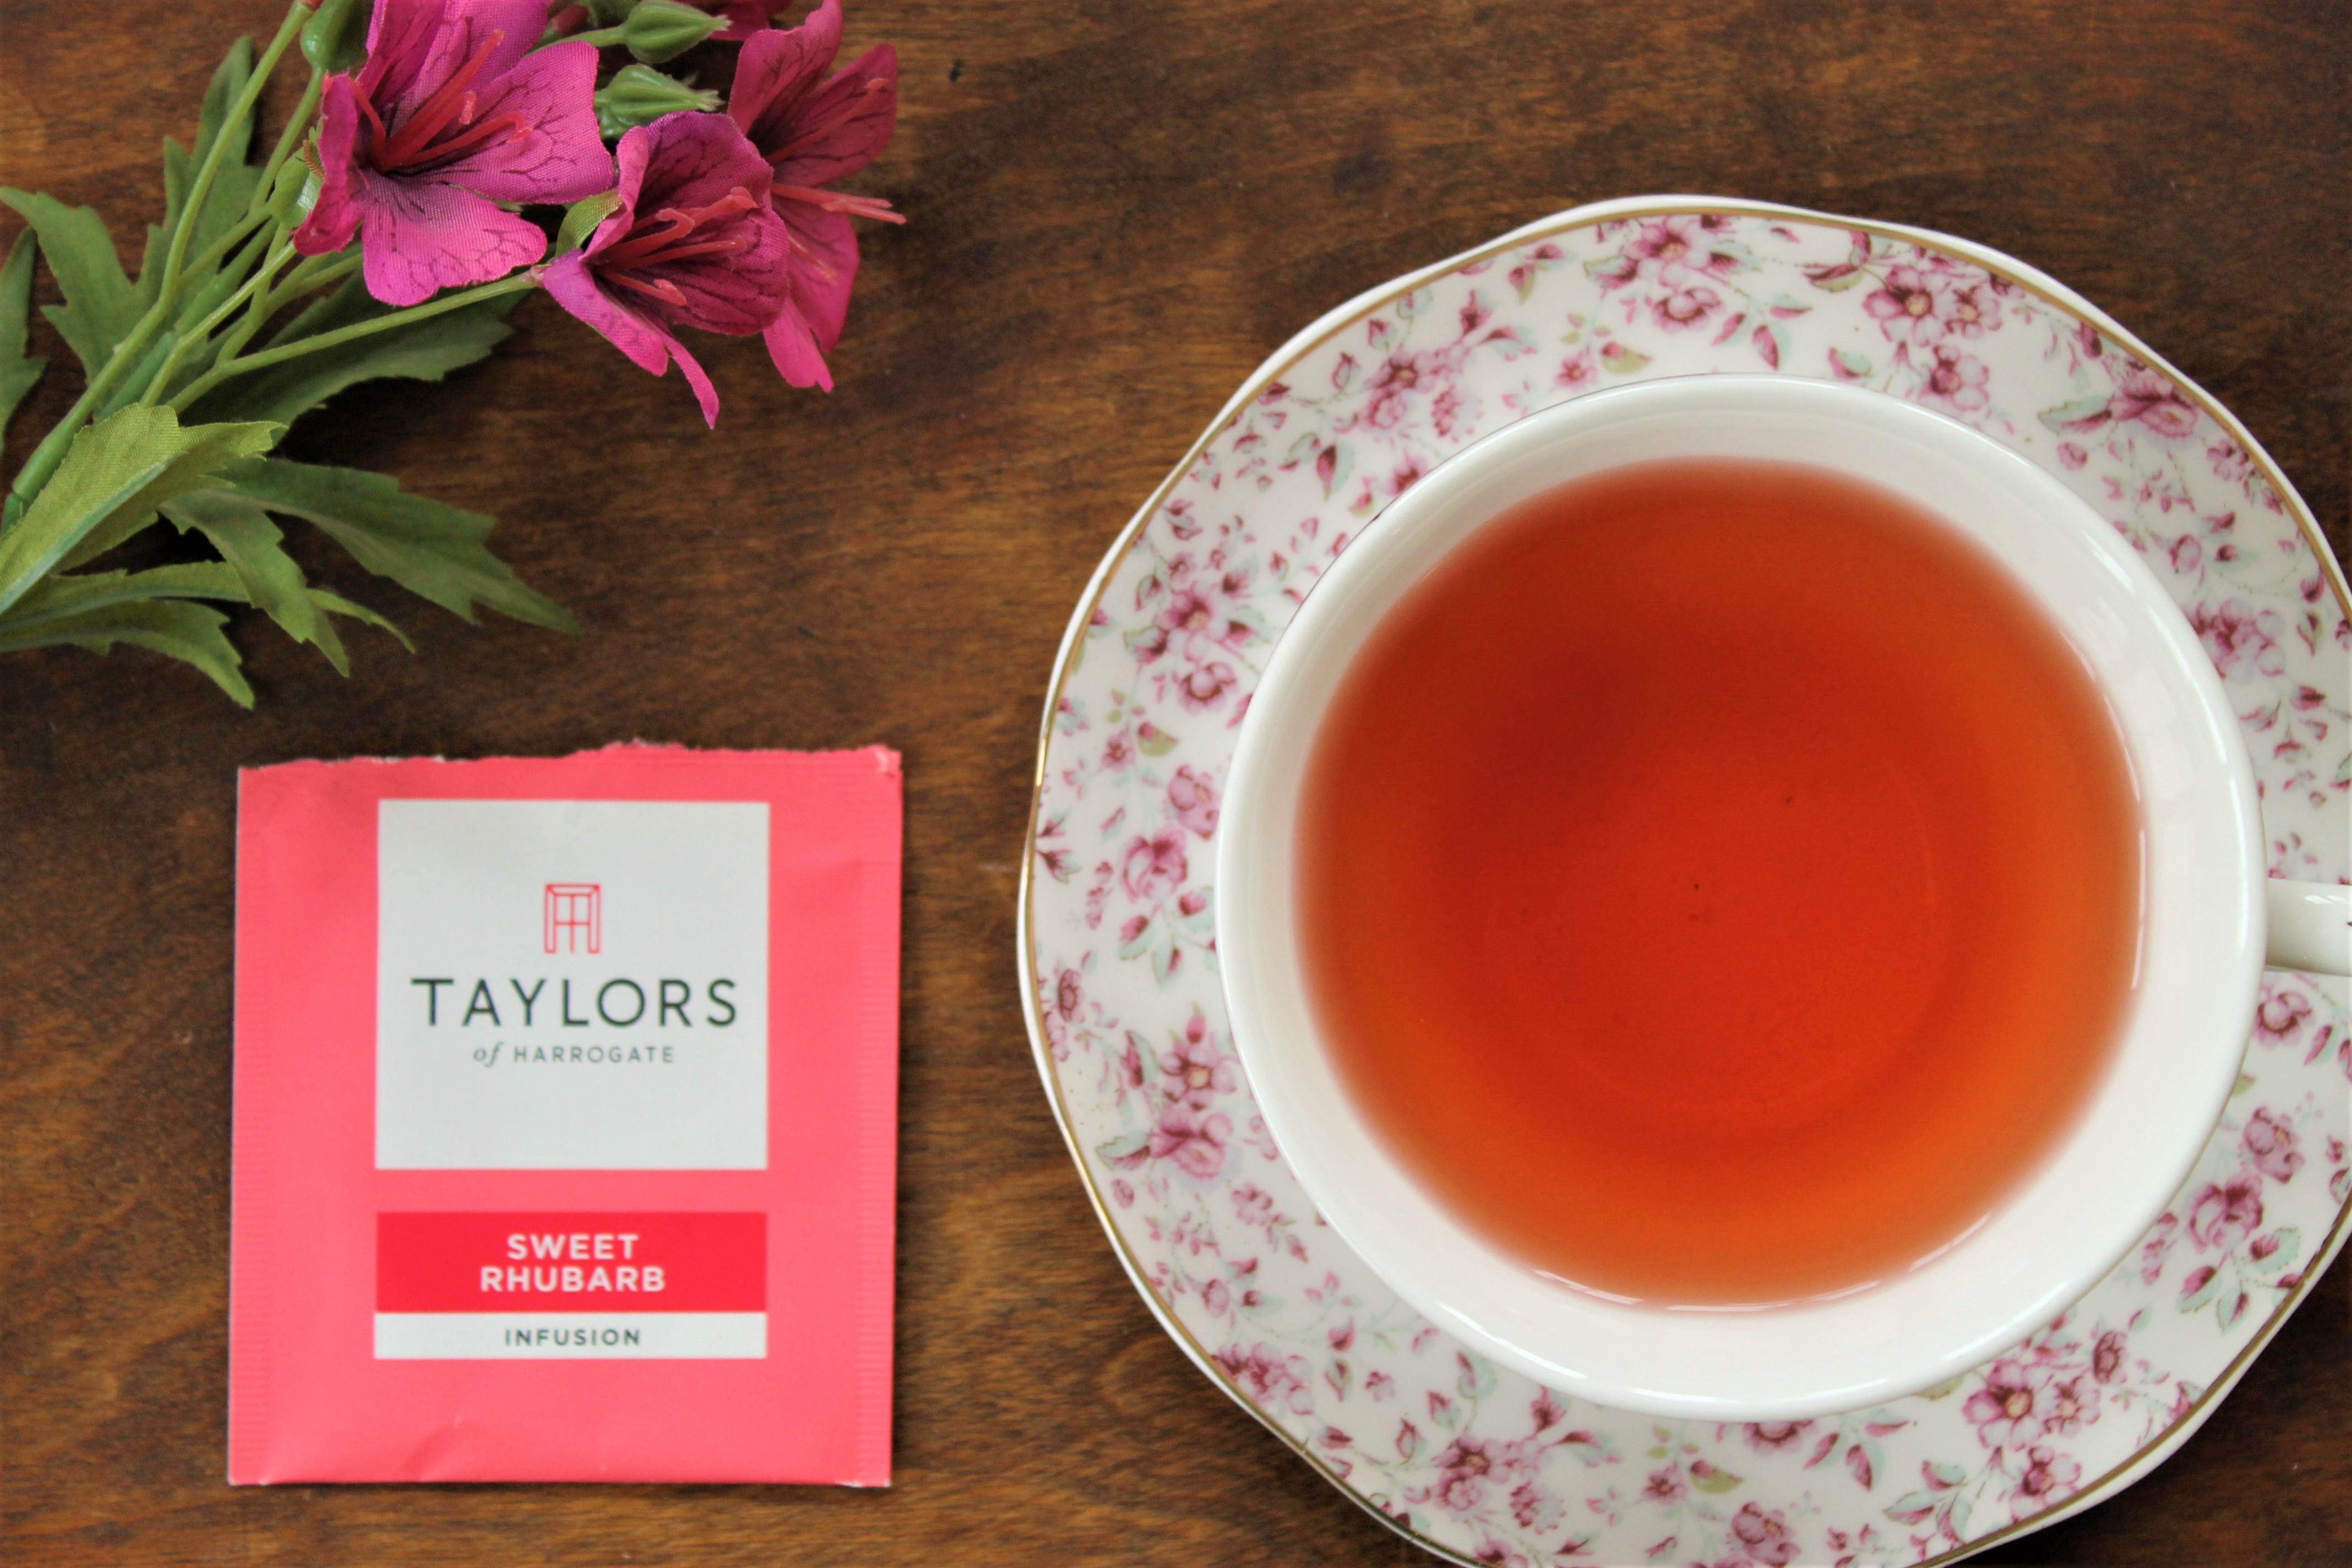 Taylors of Harrogate Sweet Rhubarb Tea Review